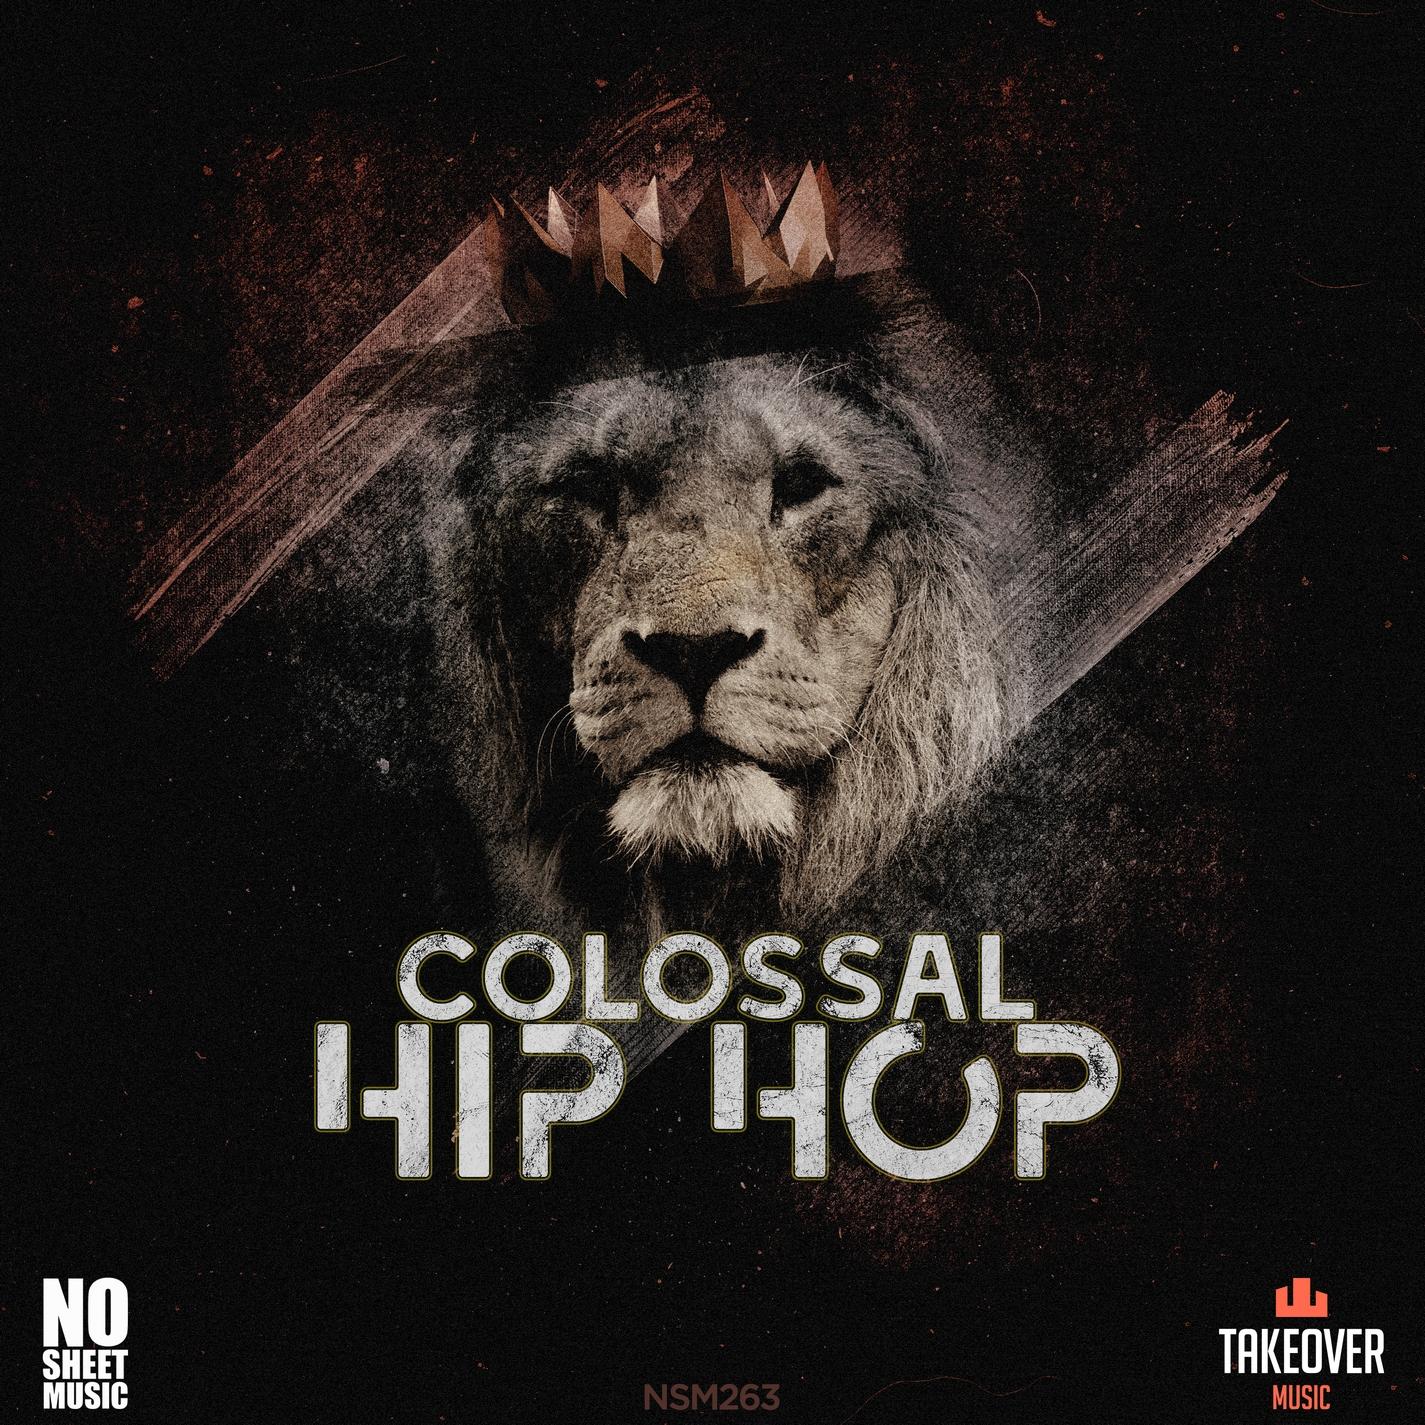 Colossal Hip Hop